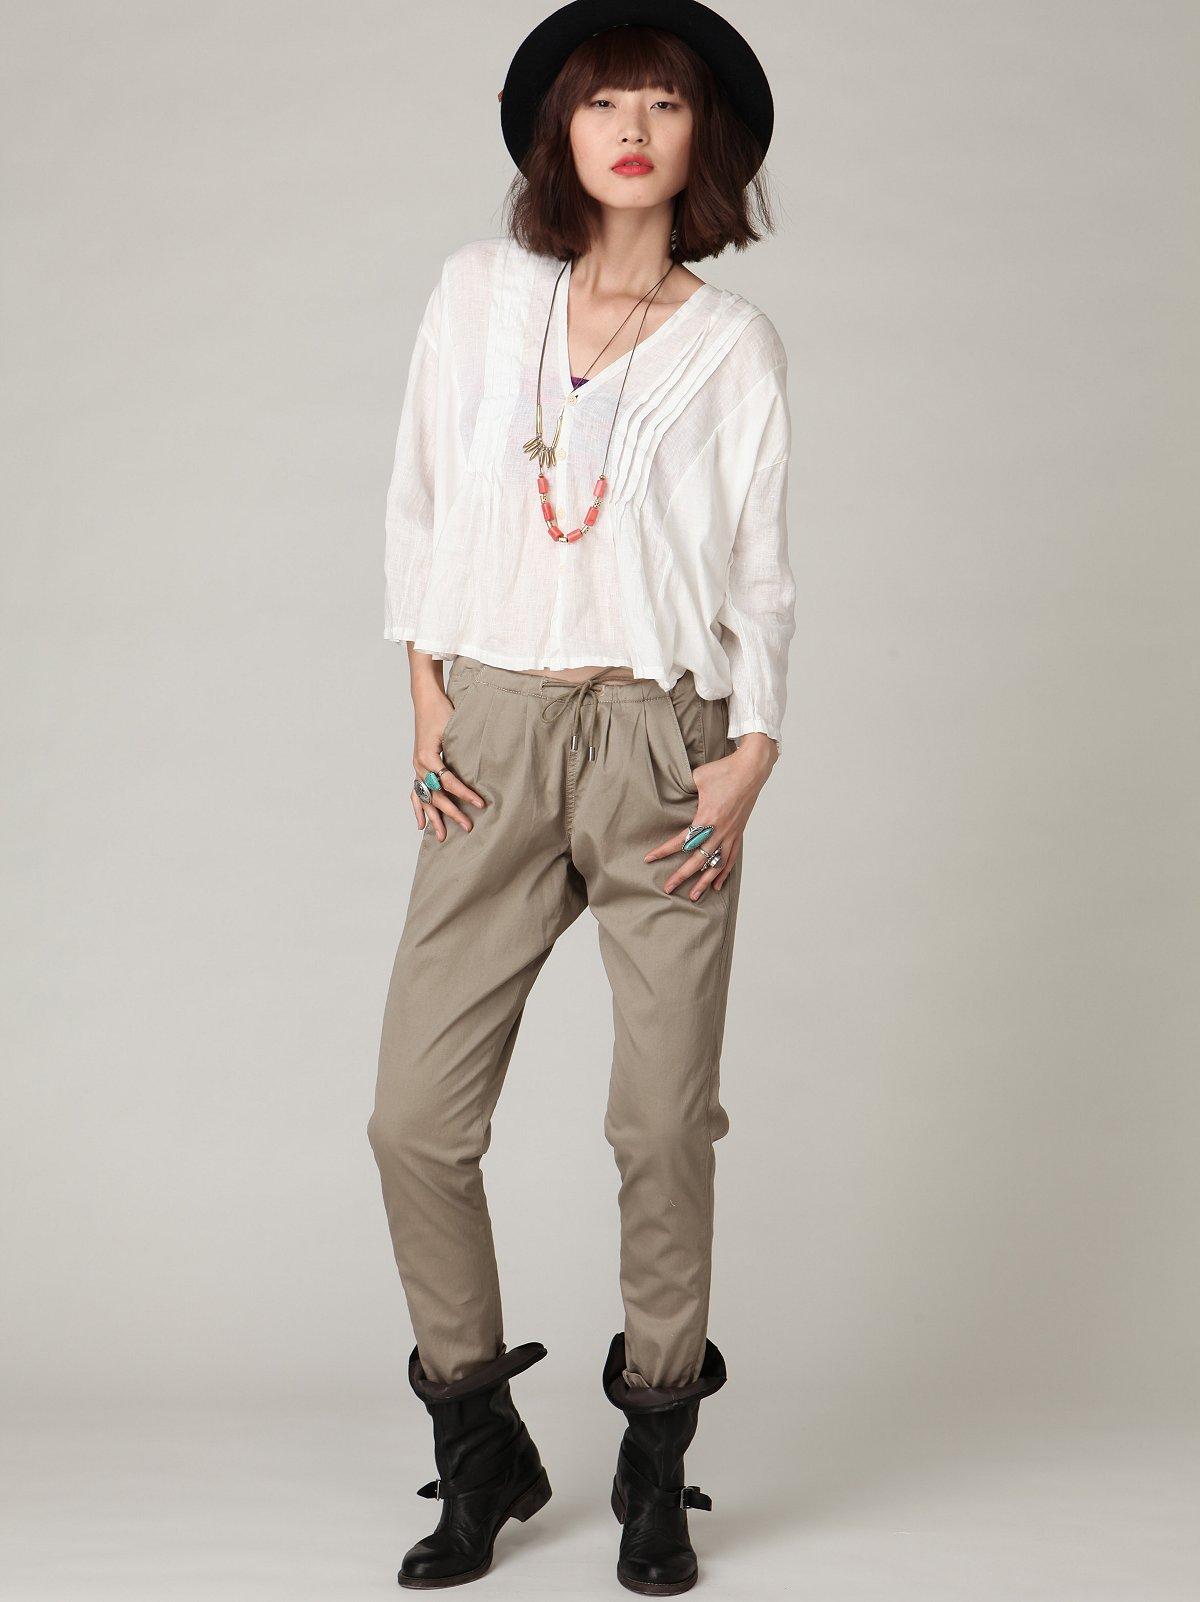 Blank Khaki Drawstring Pant